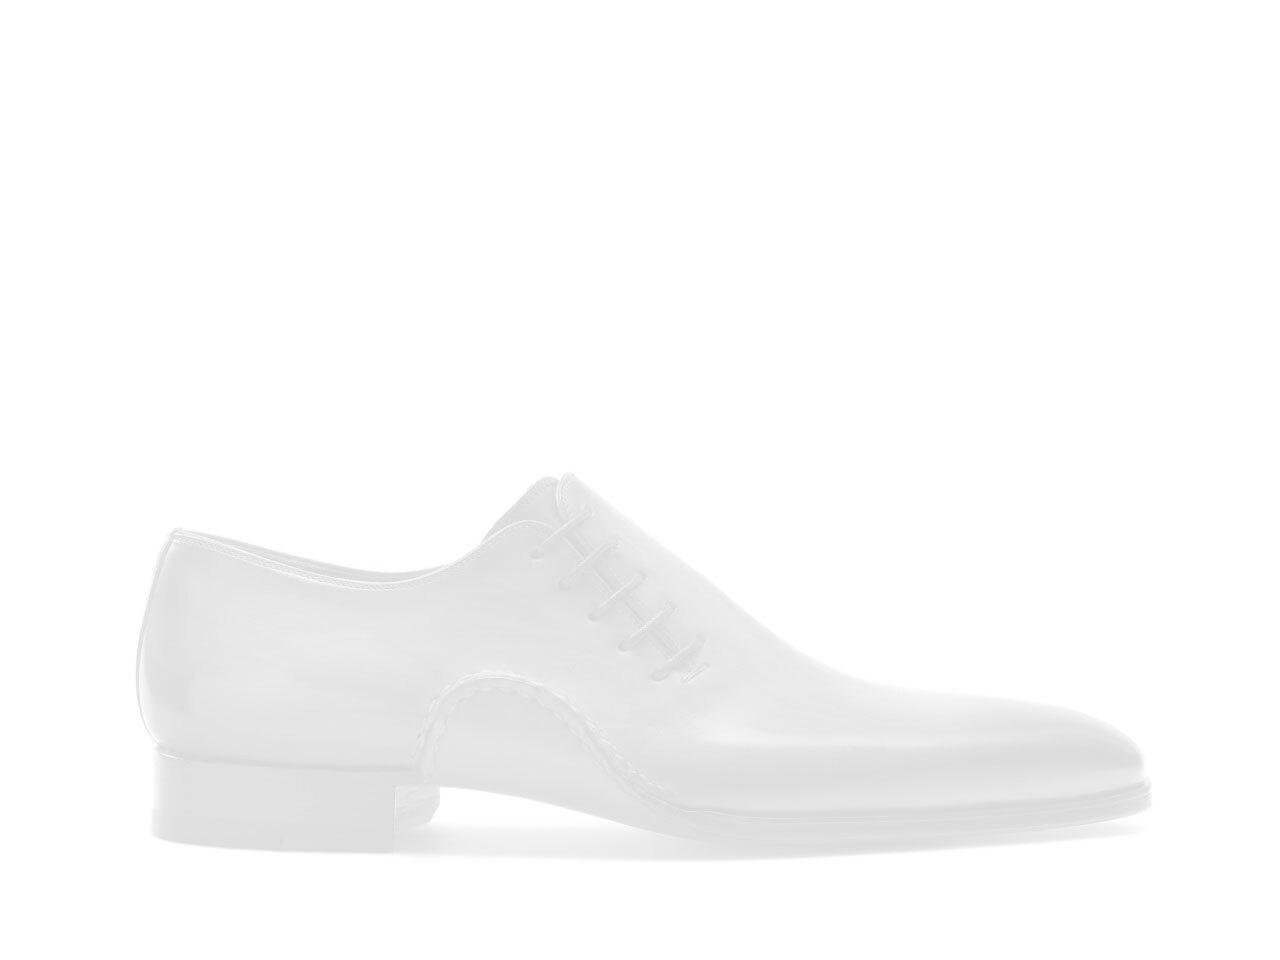 Cognac brown leather bit loafer shoes for men - Magnanni